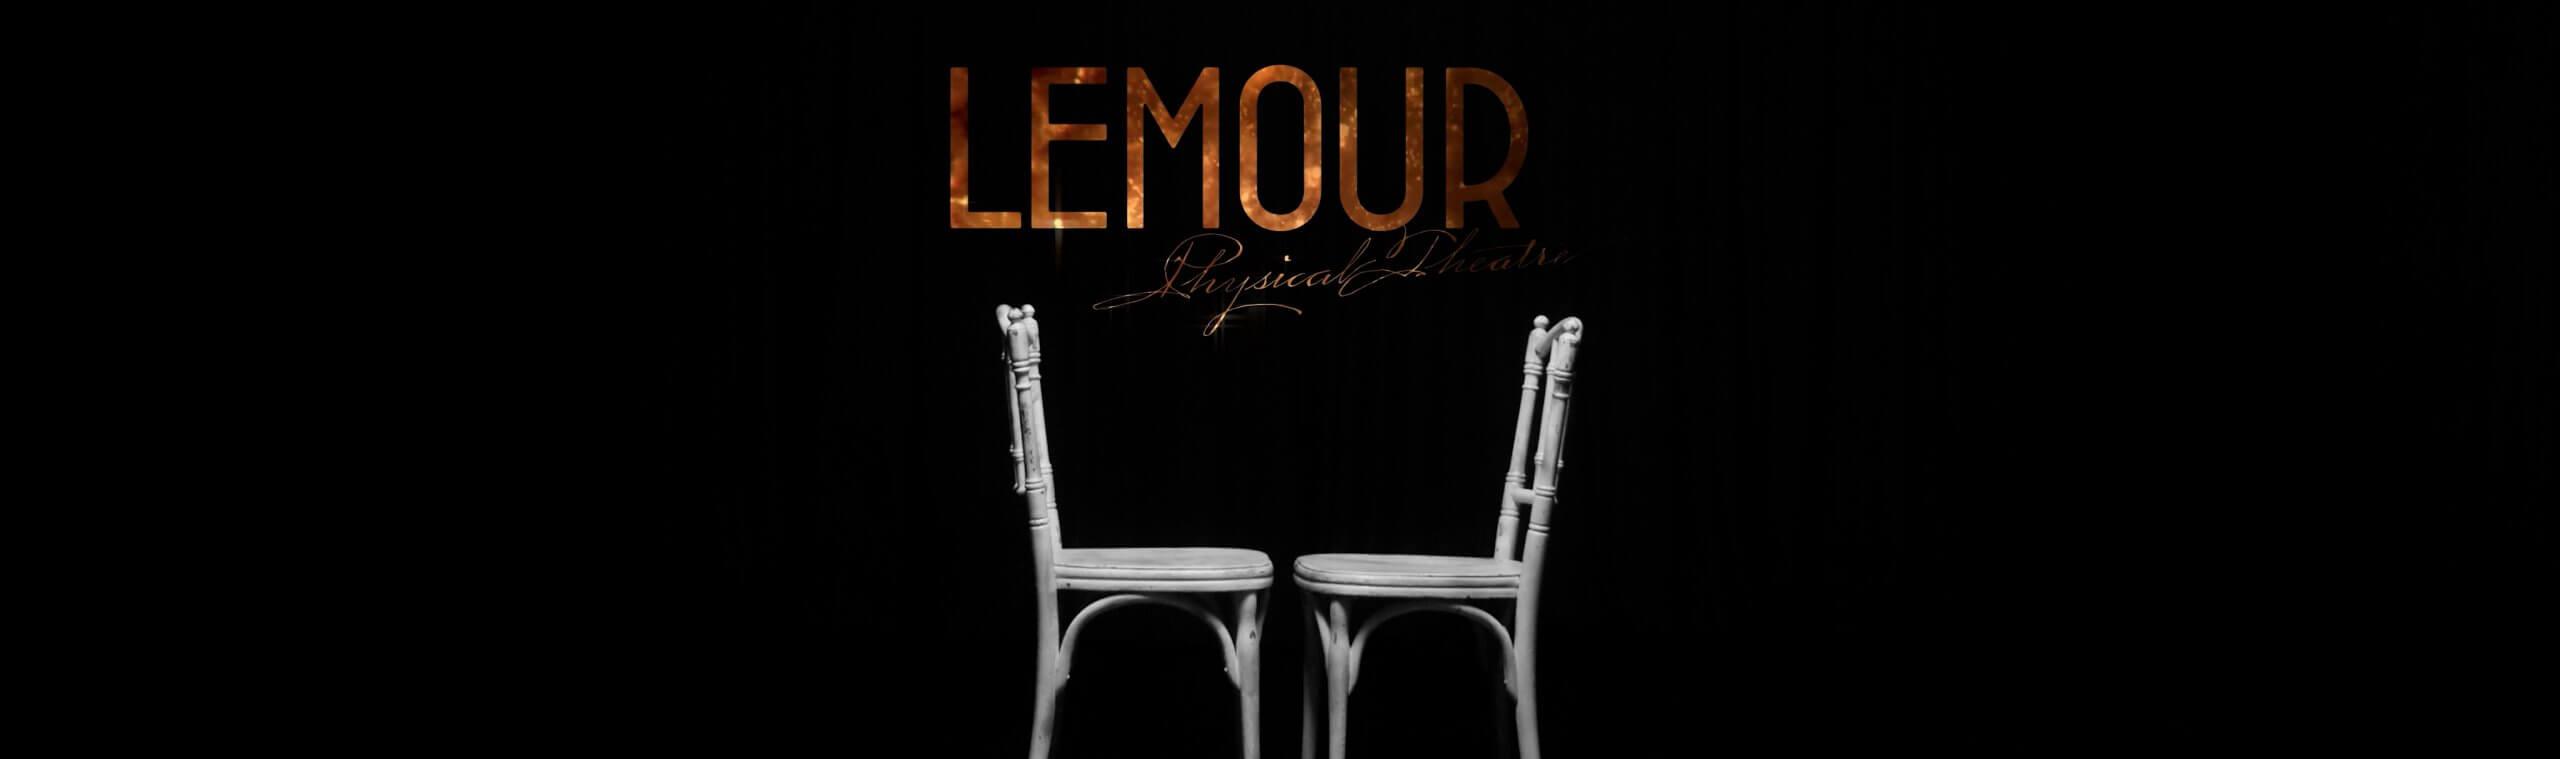 LEMOUR· DIGITALES